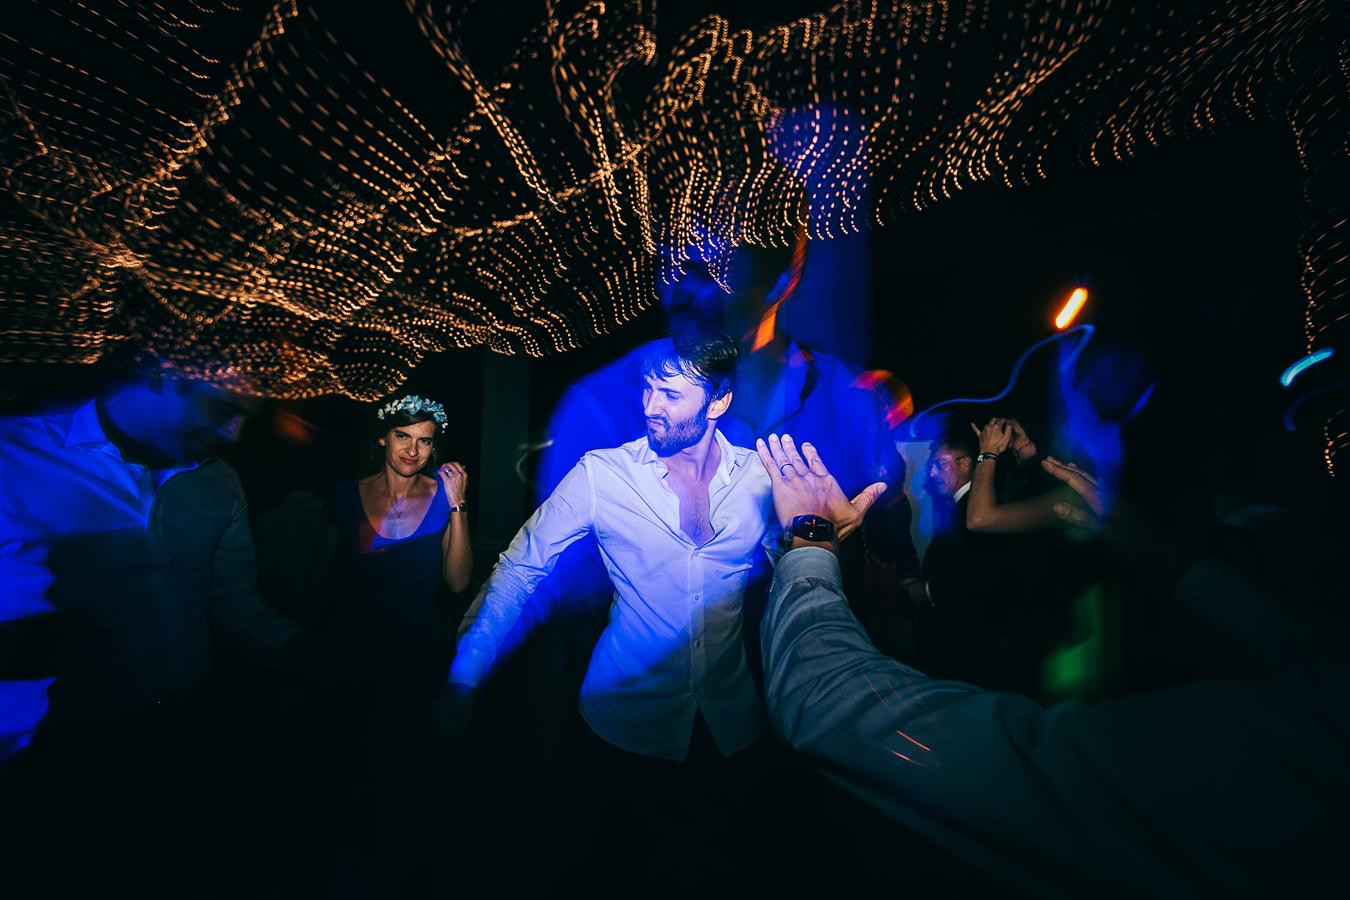 wedding_champetre_domaine_patras_a+p-874.jpg